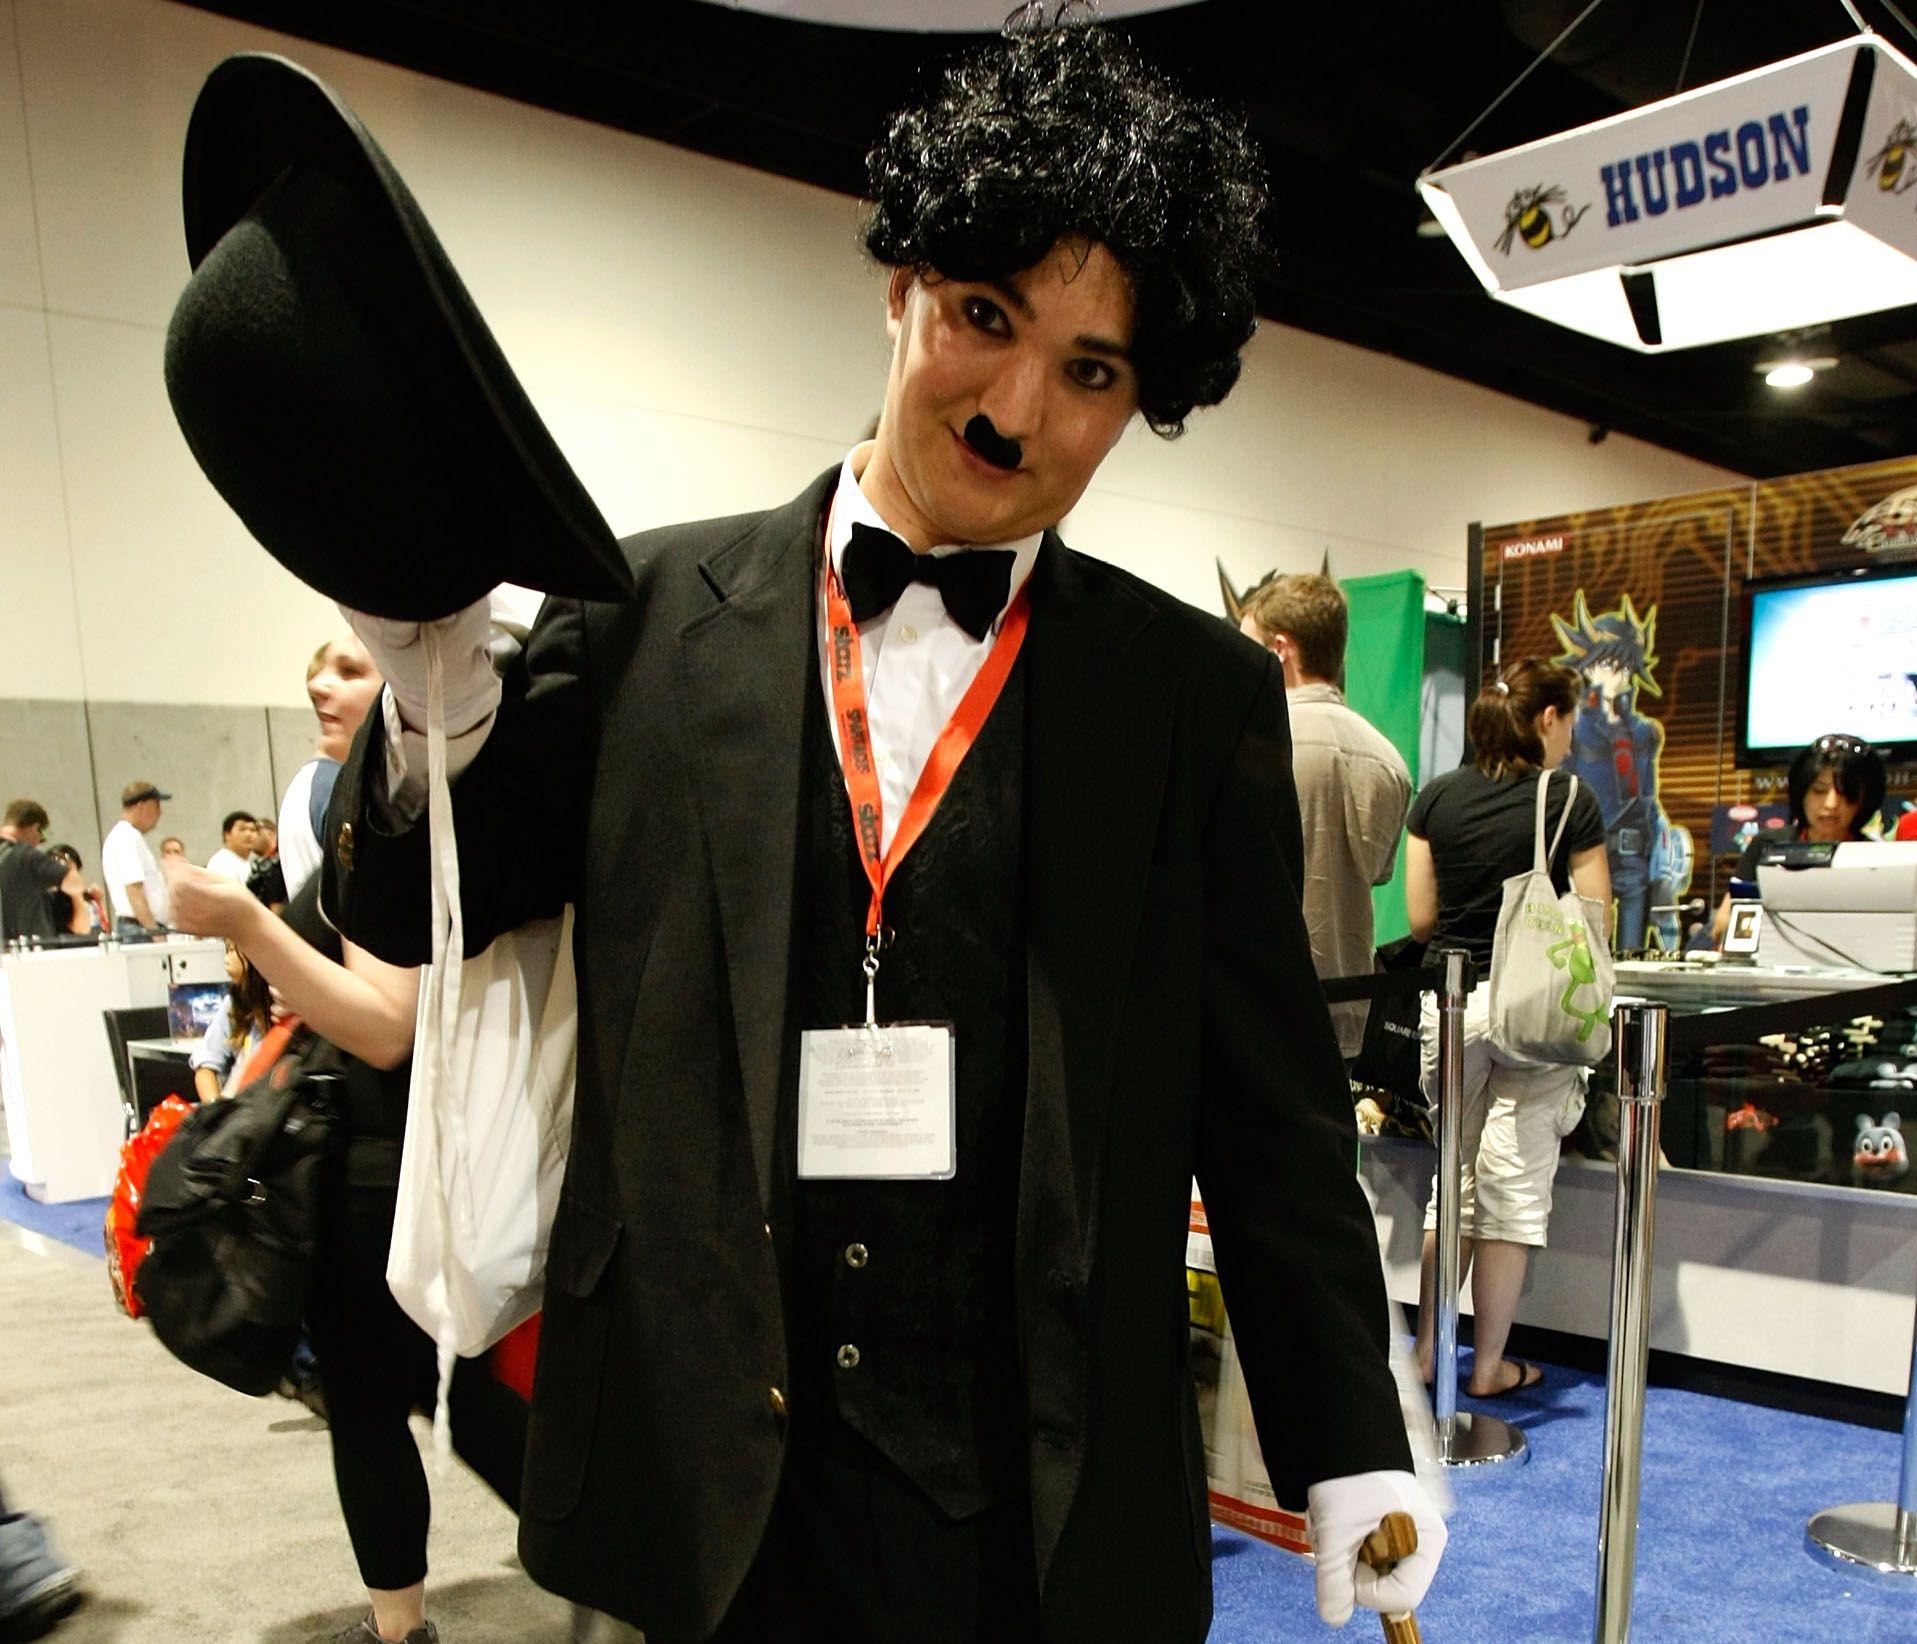 b6137c05a6a5d How to Make a Charlie Chaplin Costume